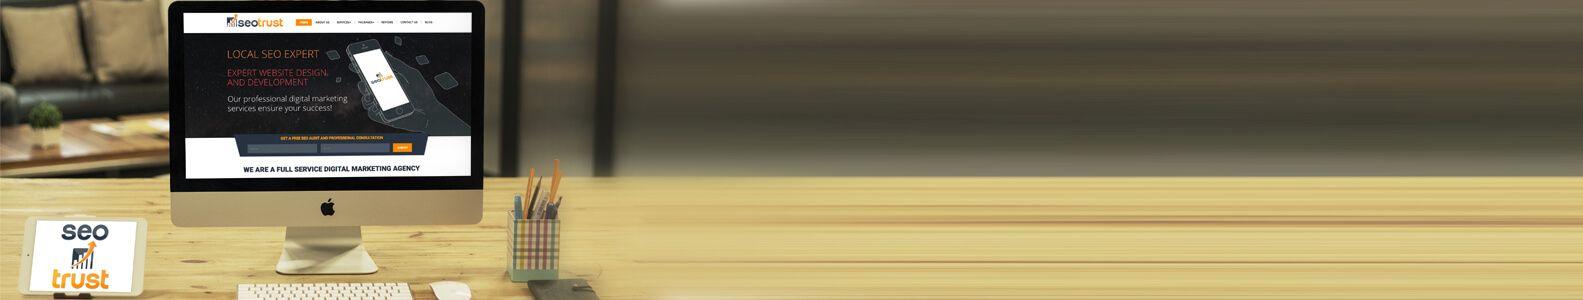 SEO TRUST Contact Us Pasadena contact seo Trust seo Trust office Seo Trust Pasadena seo Seo Services Pasadena Pasadena Seo Services Seo Services Near Me Best Seo Company Best Seo Services Seo Expert Seo Company Seo Companies Near Me Seo Services San Diego Seo Services Orange County Seo Services Improve Organic Seo Best Organic Seo Company Local Seo Services Los Angeles Local Seo Consultant Services Benefits Of Local Seo Services Affordable Local Seo Services Local Seo Optimization Services Local Seo Expert Local Seo Company Local Seo Agency